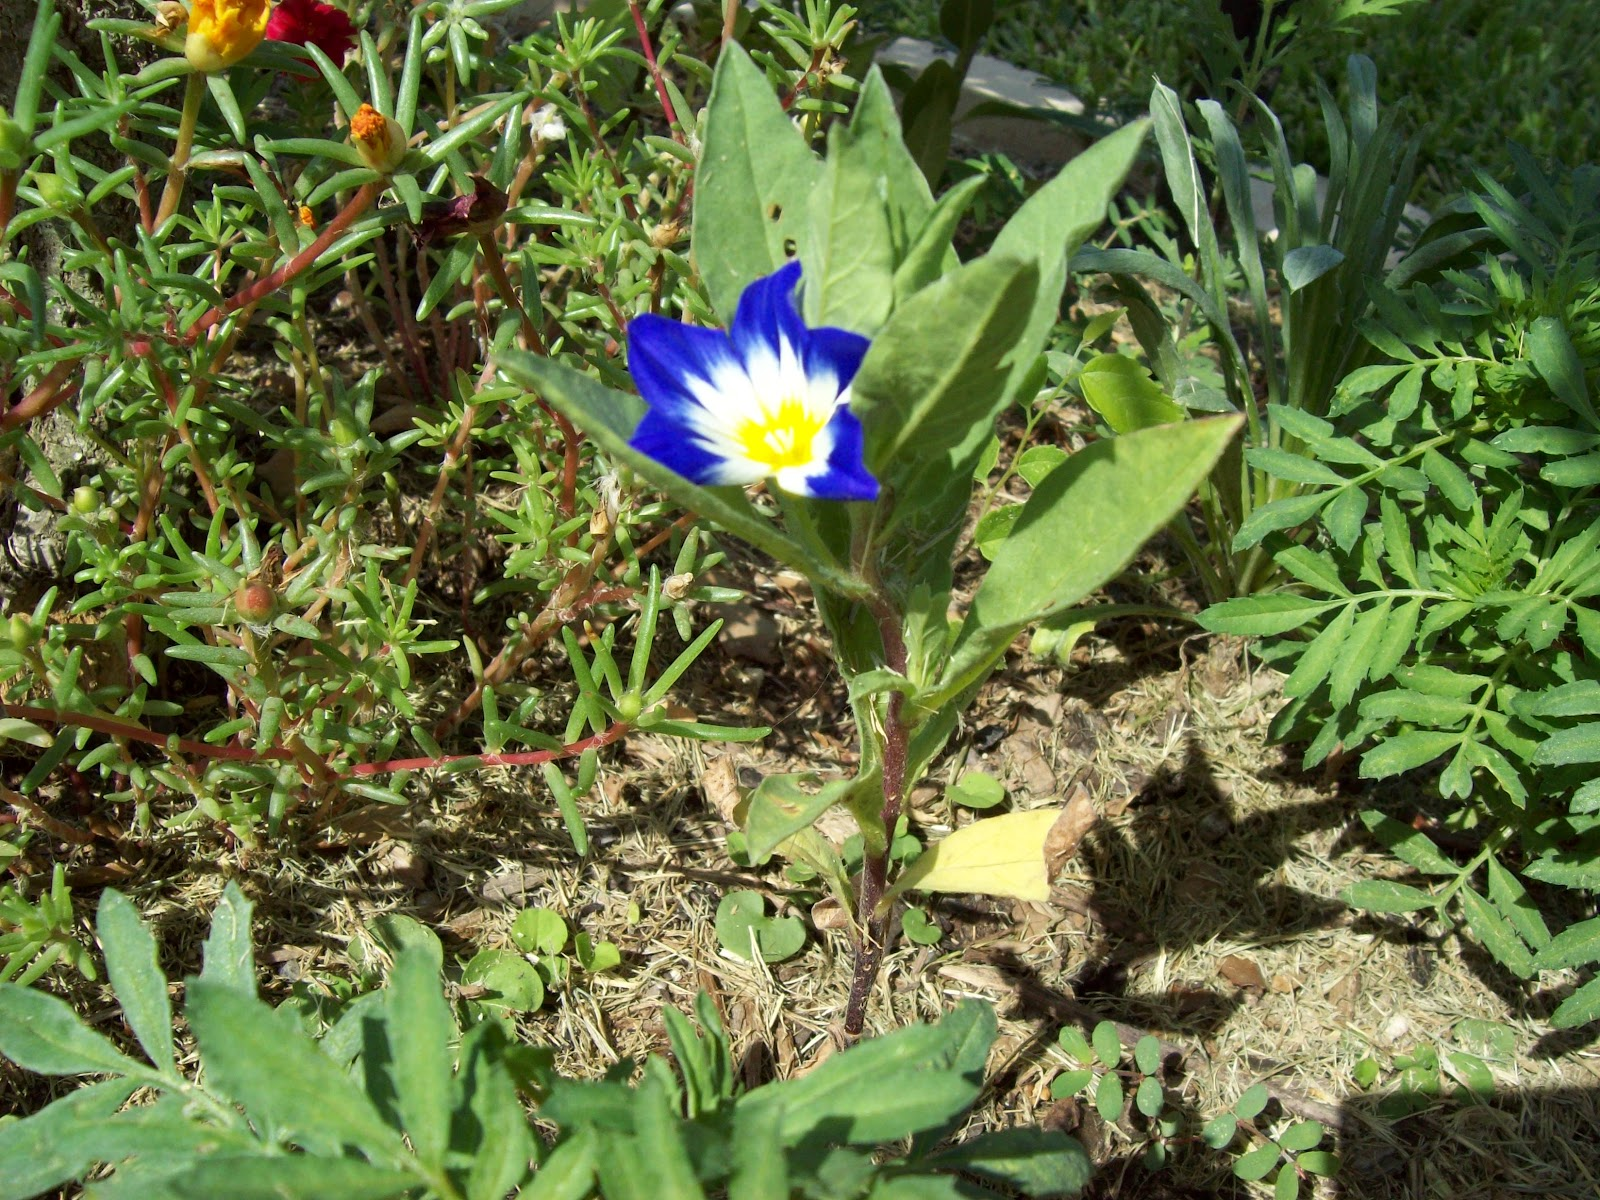 Gardening 2009 - 101_4891.JPG